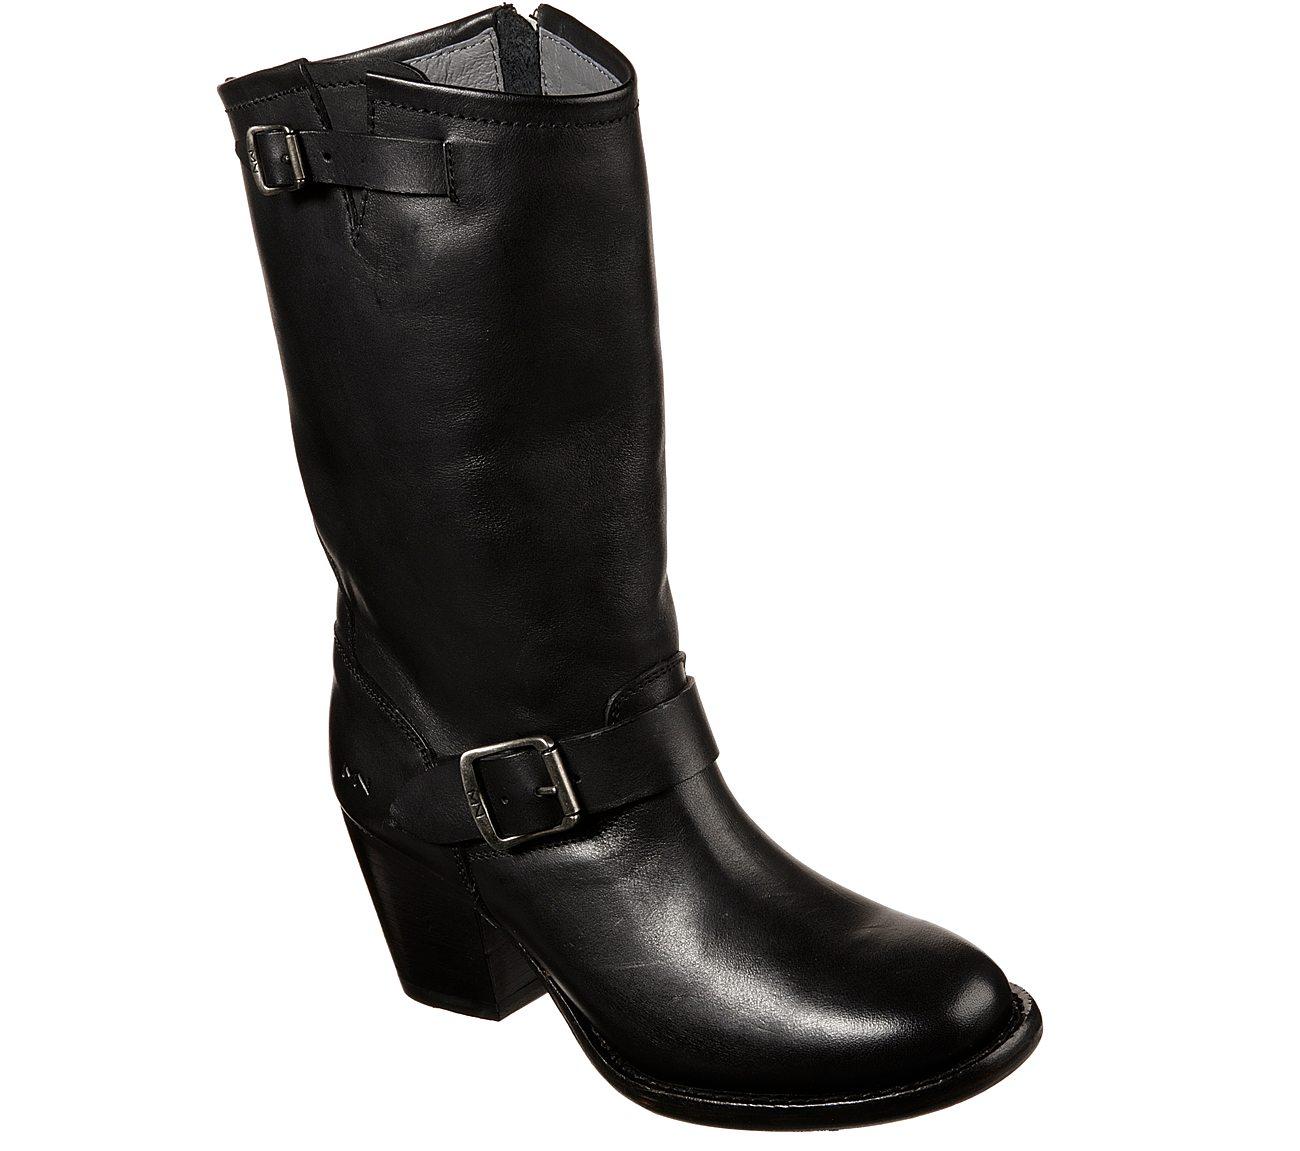 skechers knee high shoes